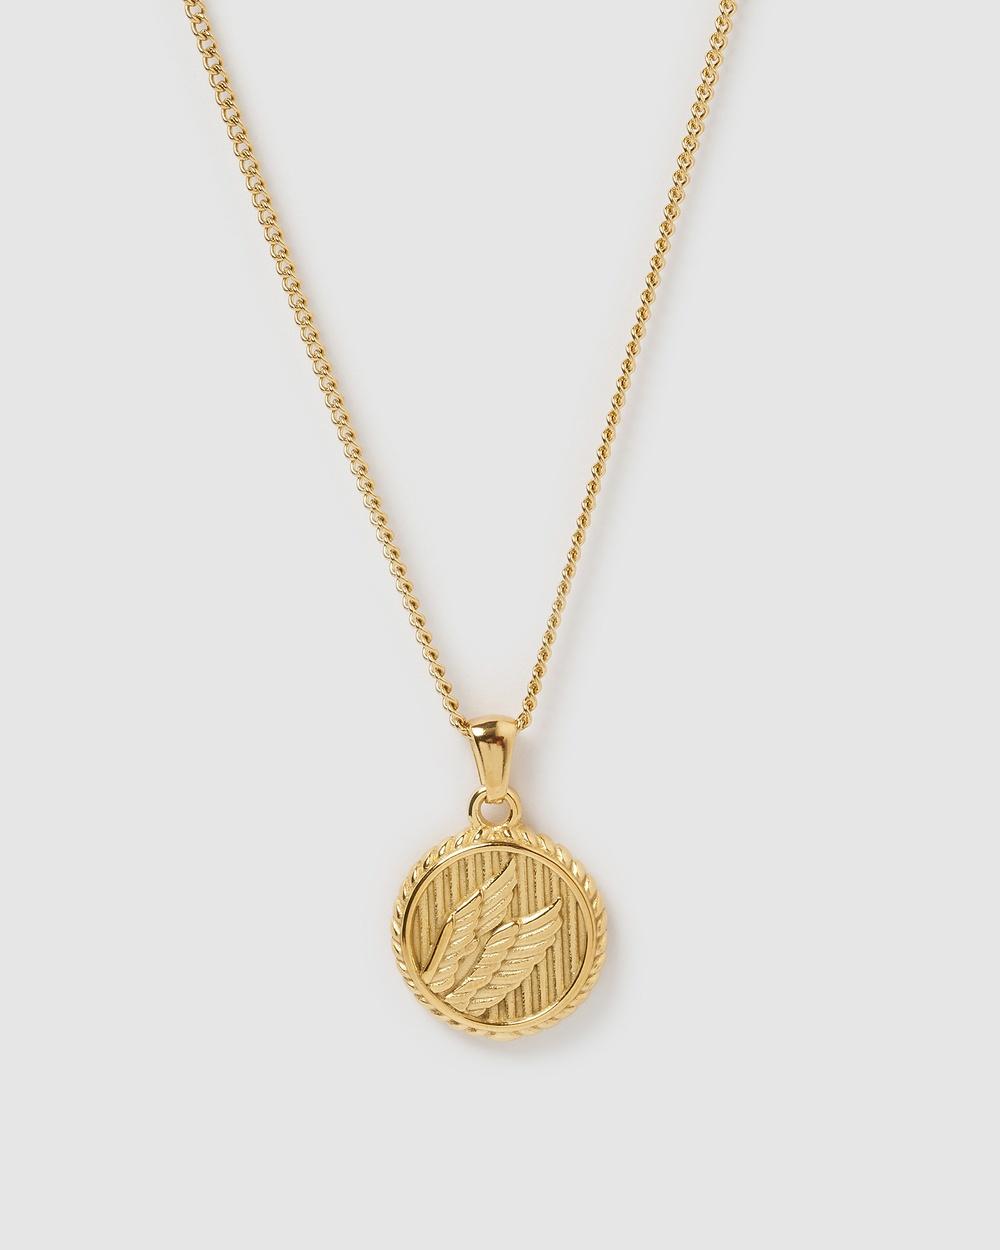 Miz Casa and Co Amanda Pendant Necklace Jewellery Gold